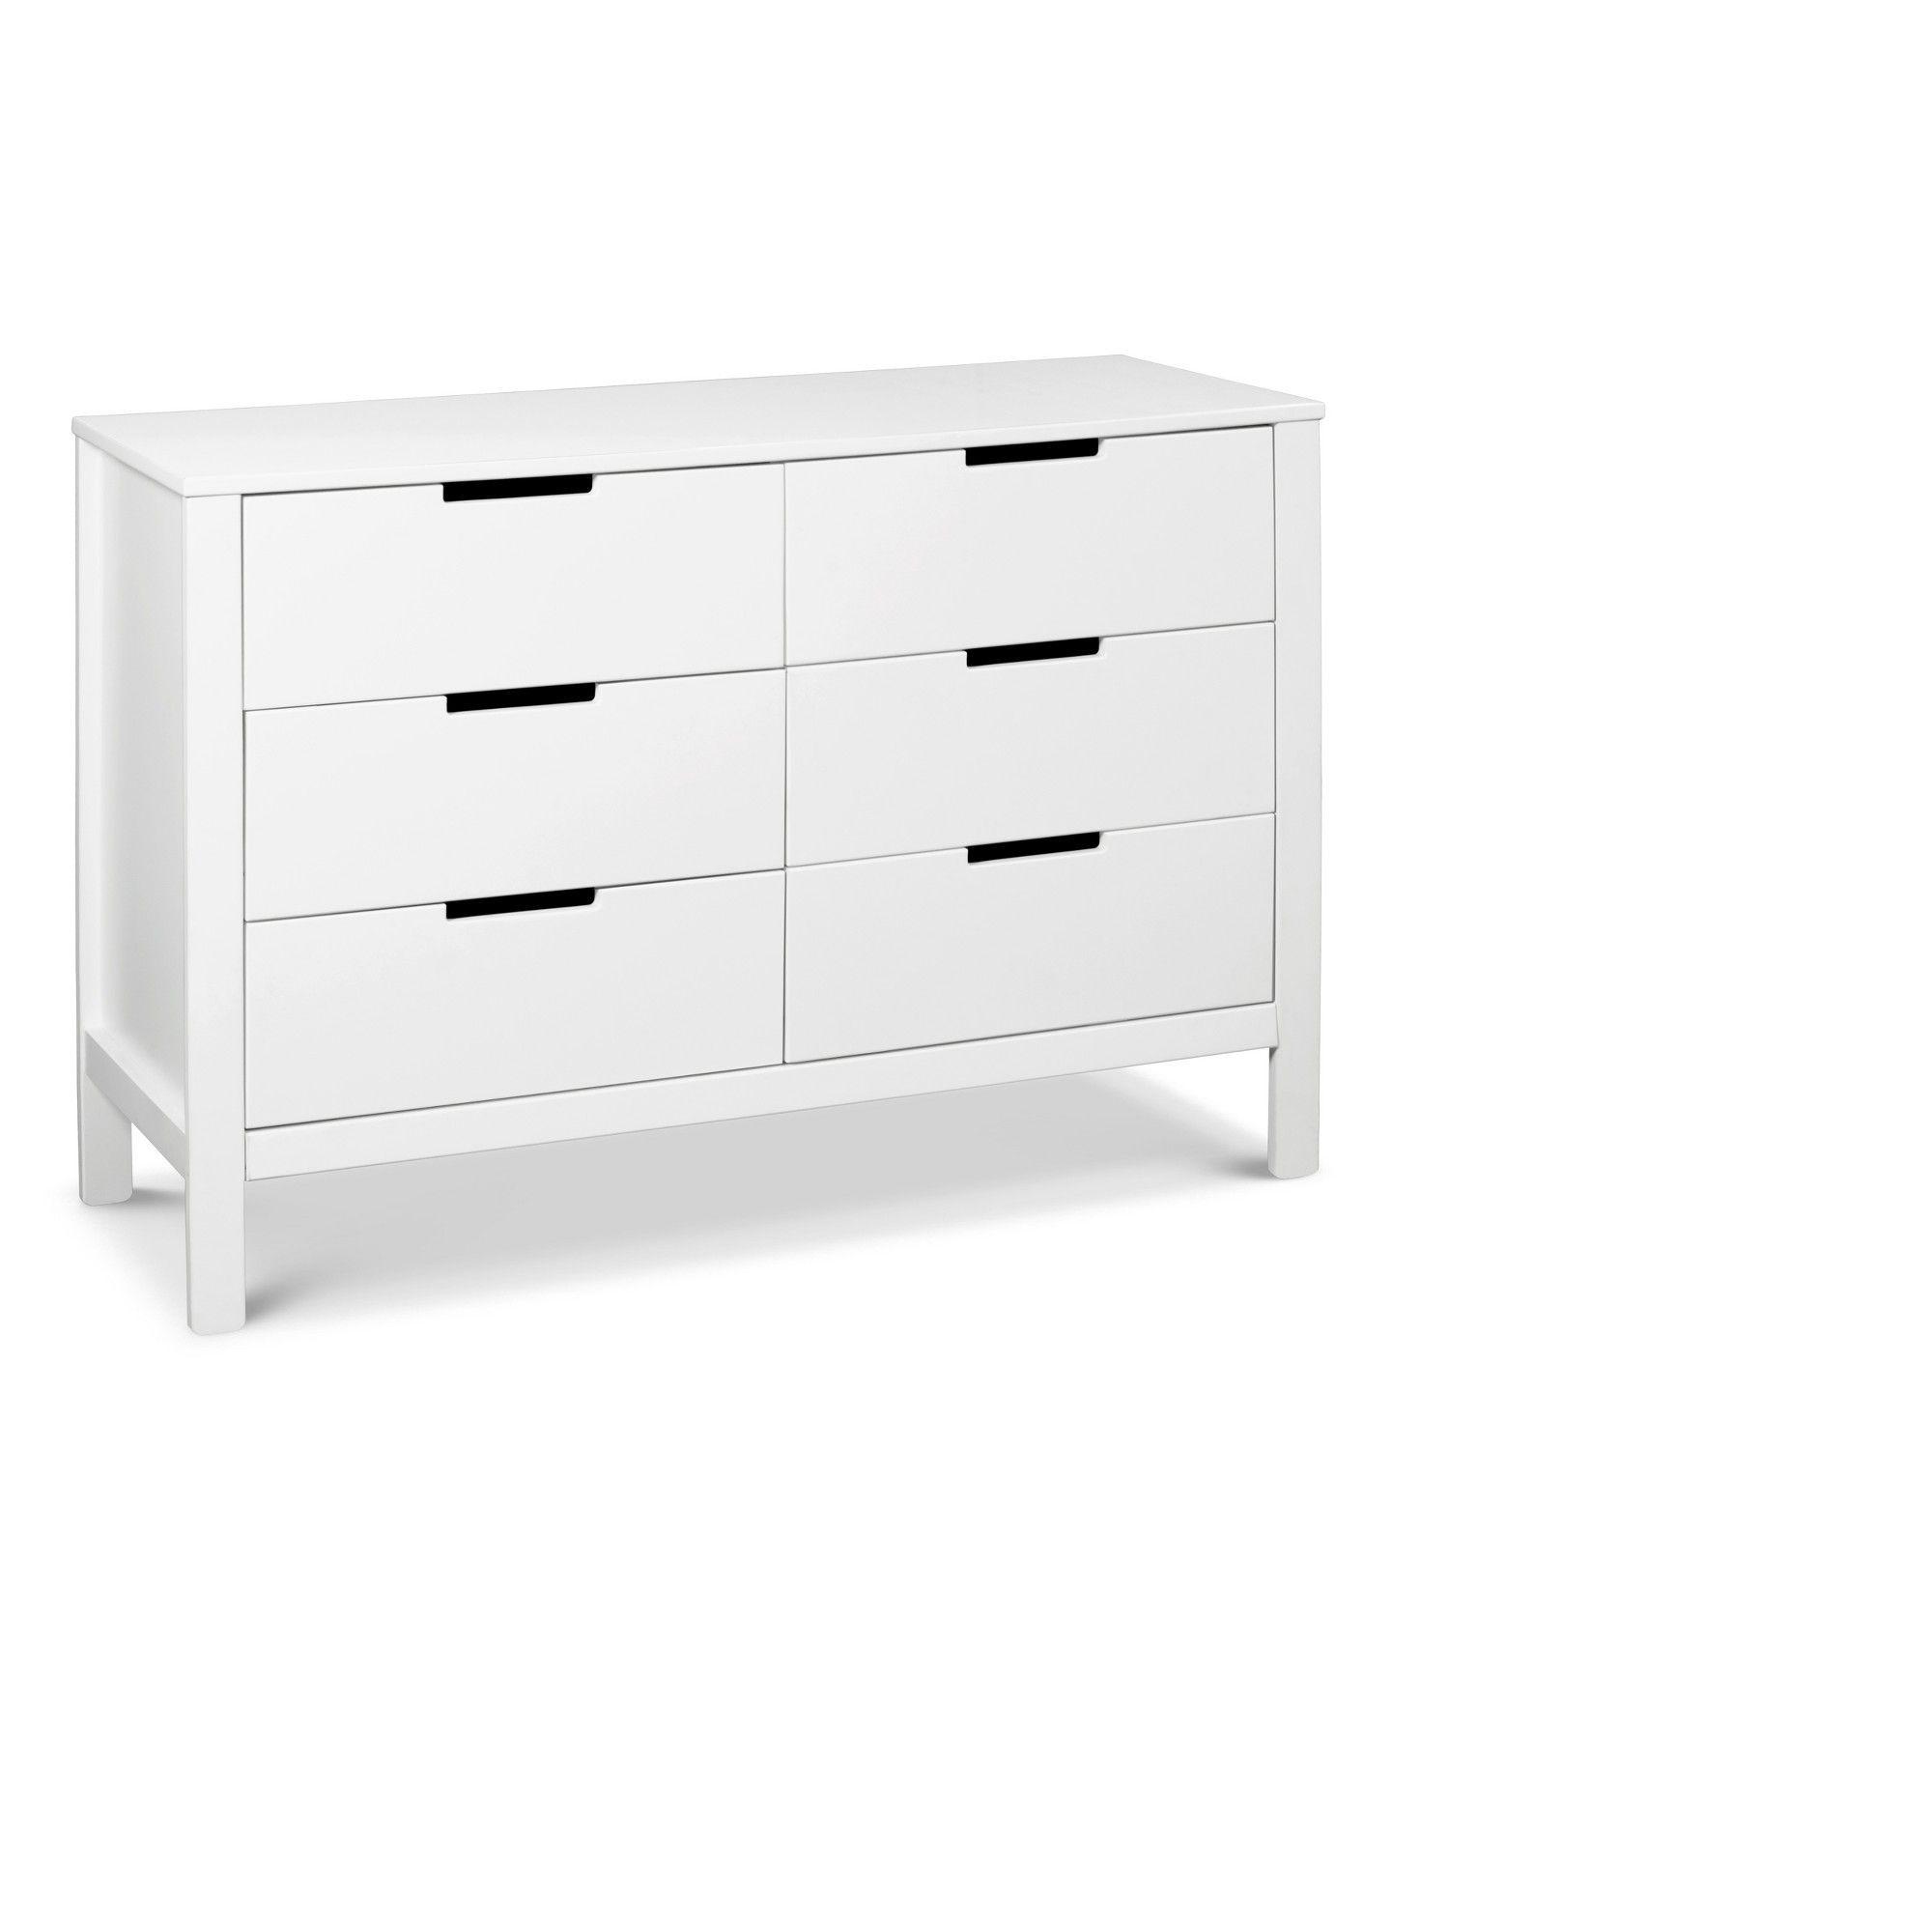 Carter S By Davinci Colby 6 Drawer Dresser White Dresser Drawers